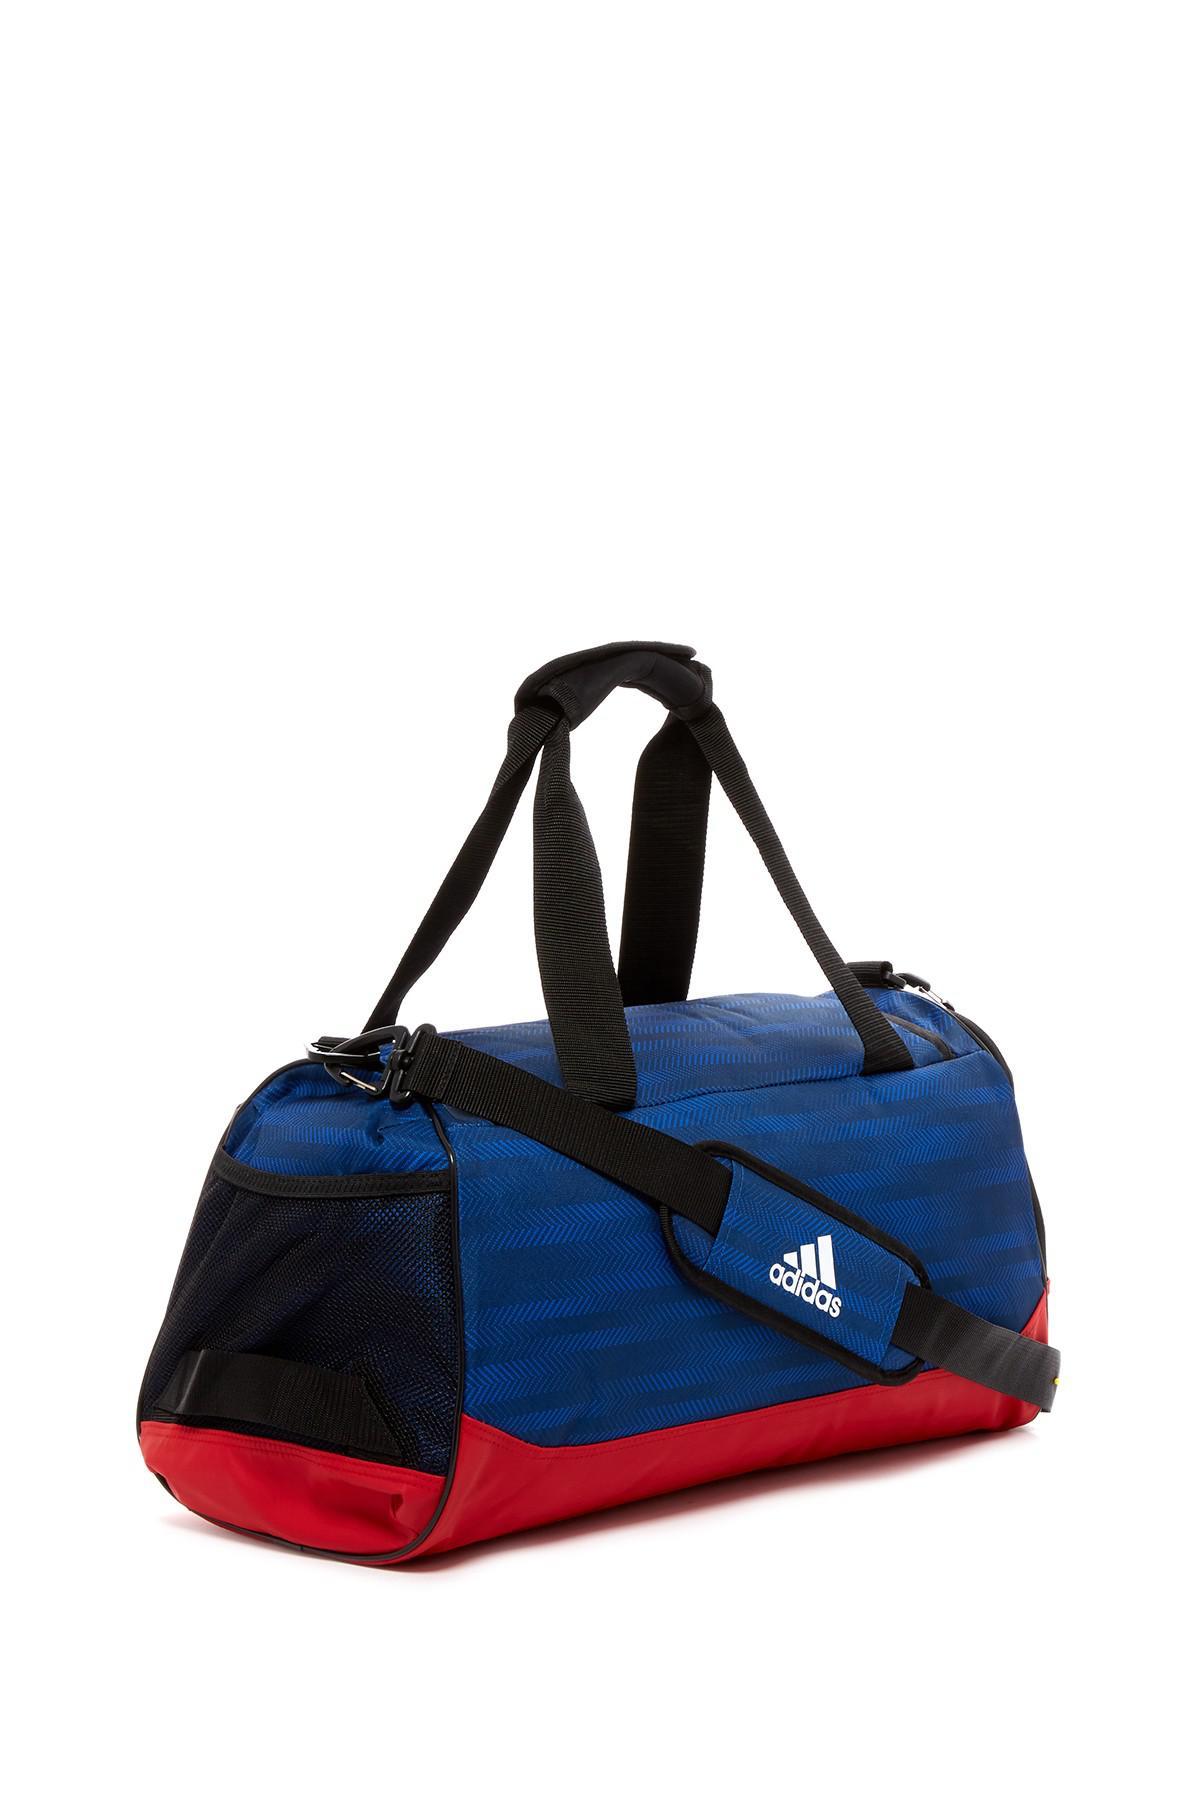 Lyst - Adidas Originals Team Issue Small Duffle Bag in Blue for Men de4825afa9970